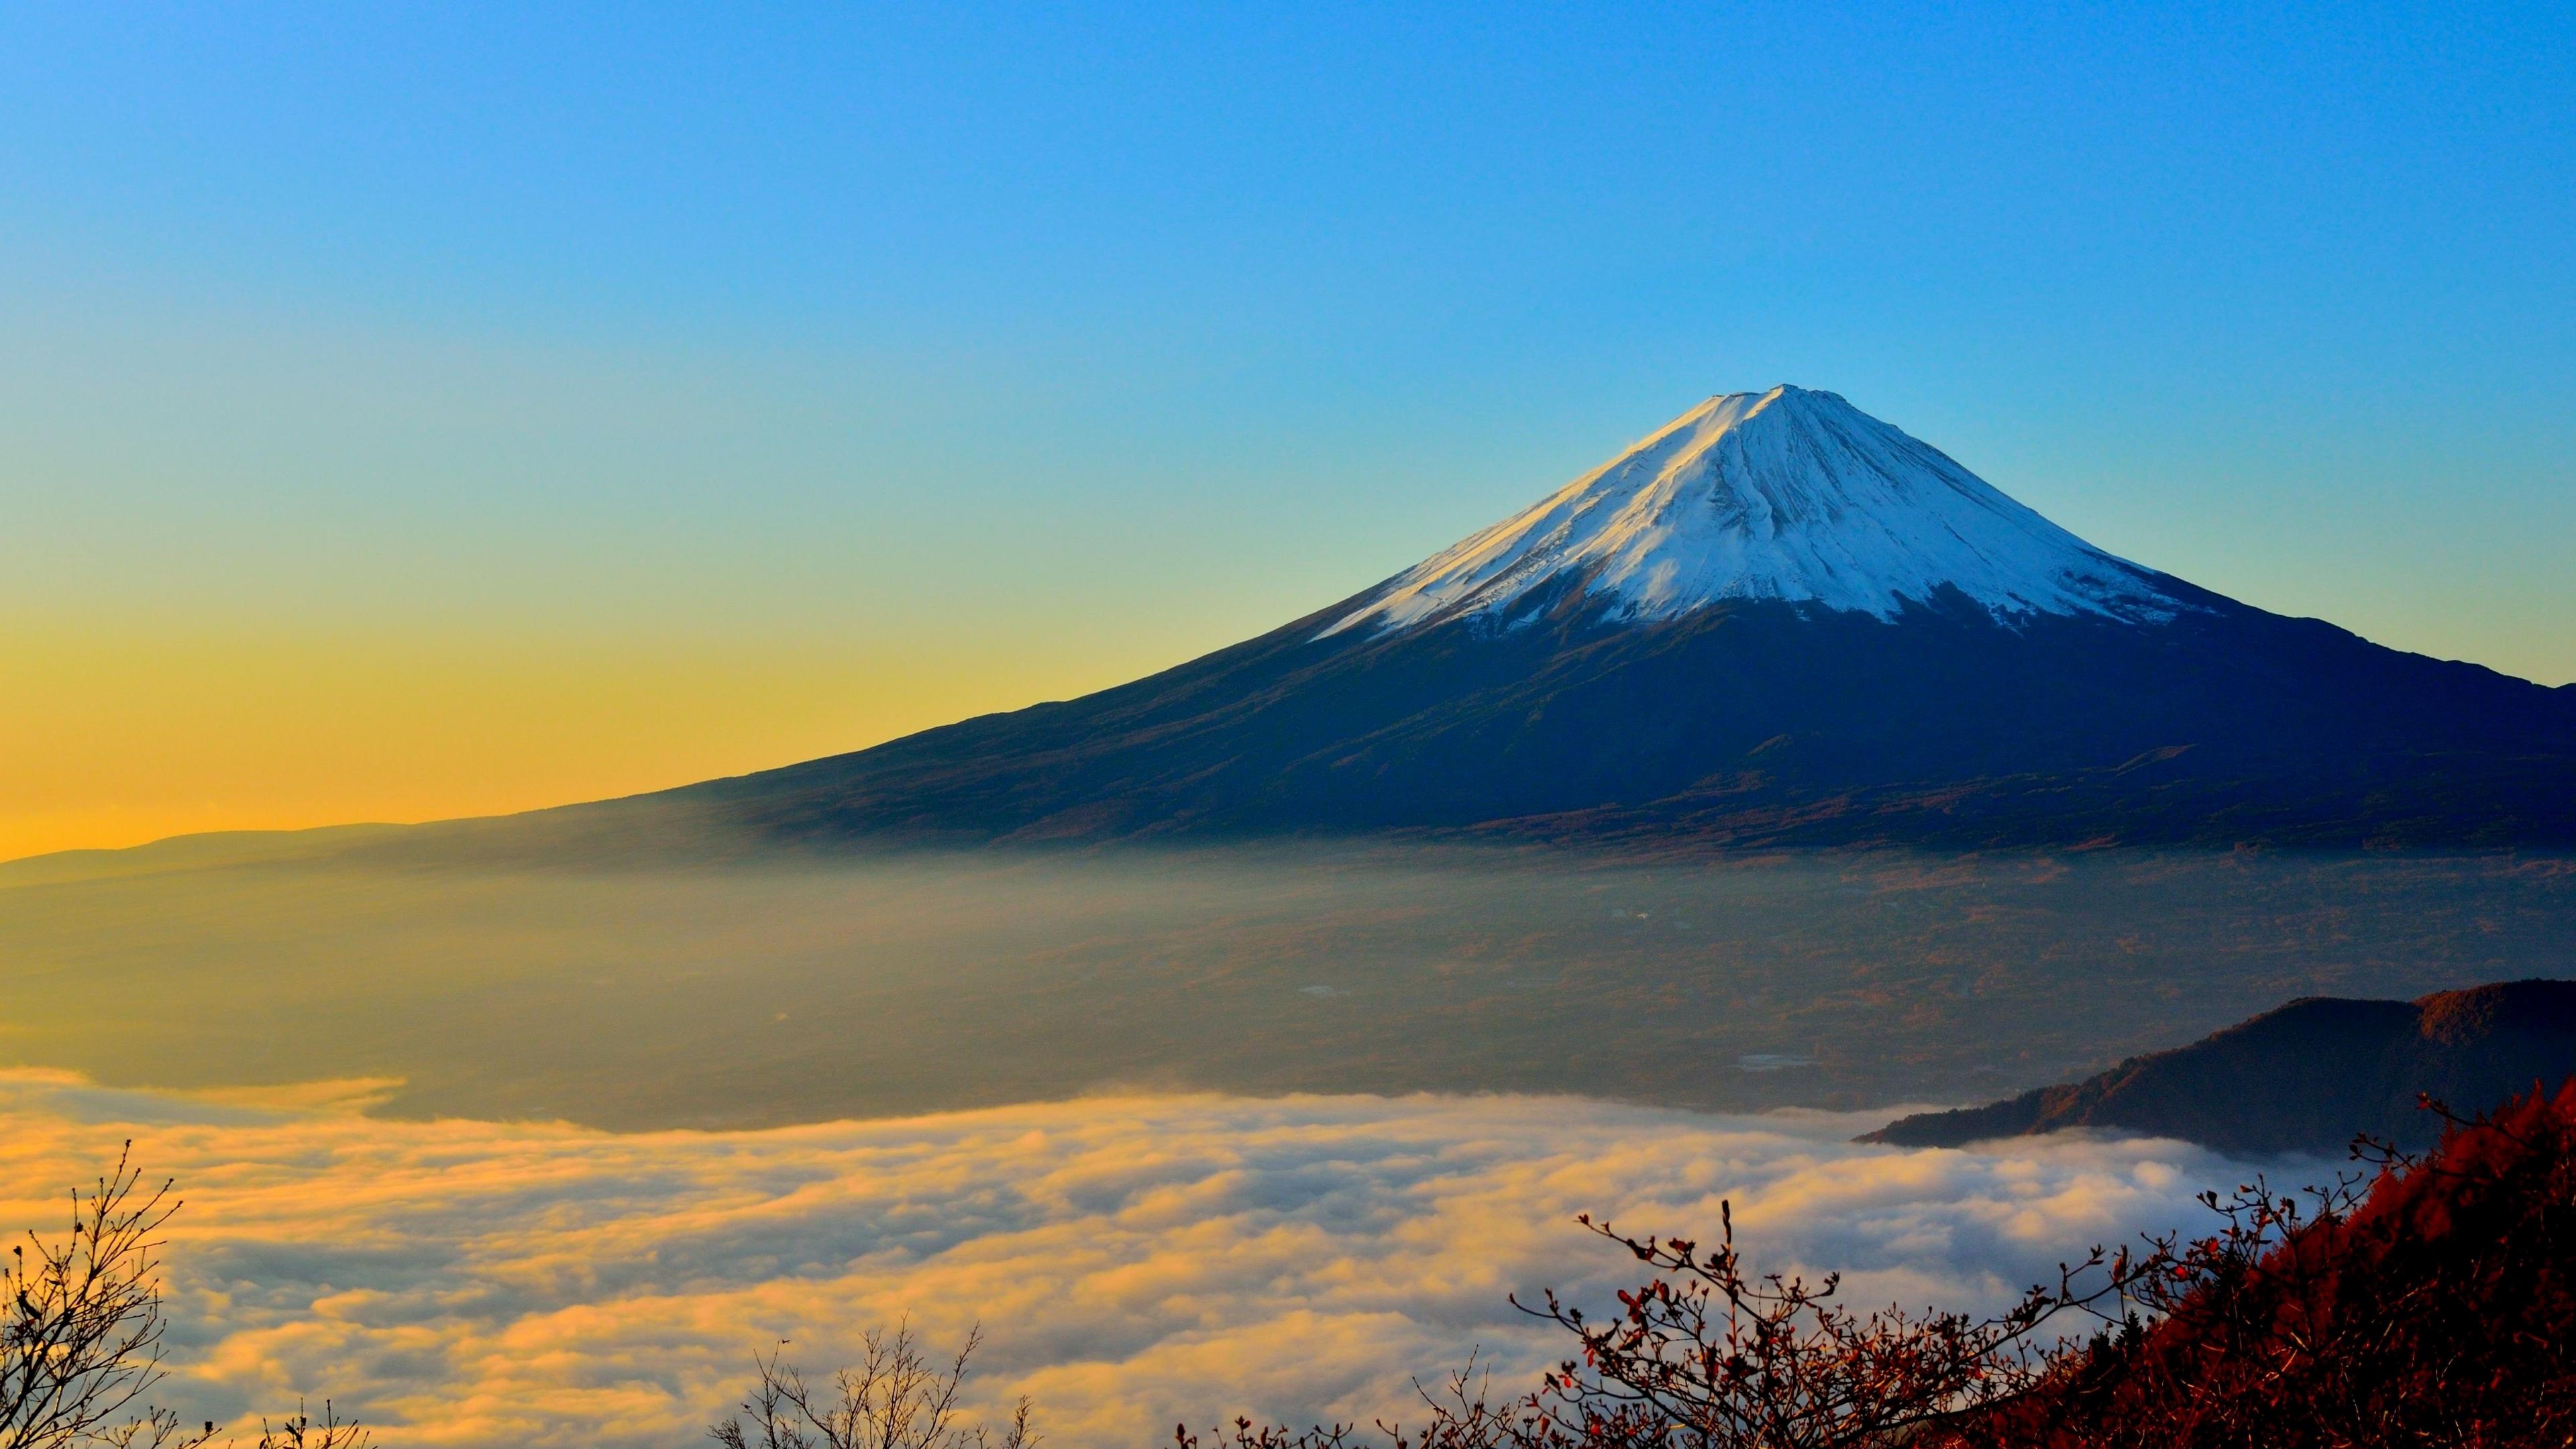 Mount Fuji Mountain 3840x2160